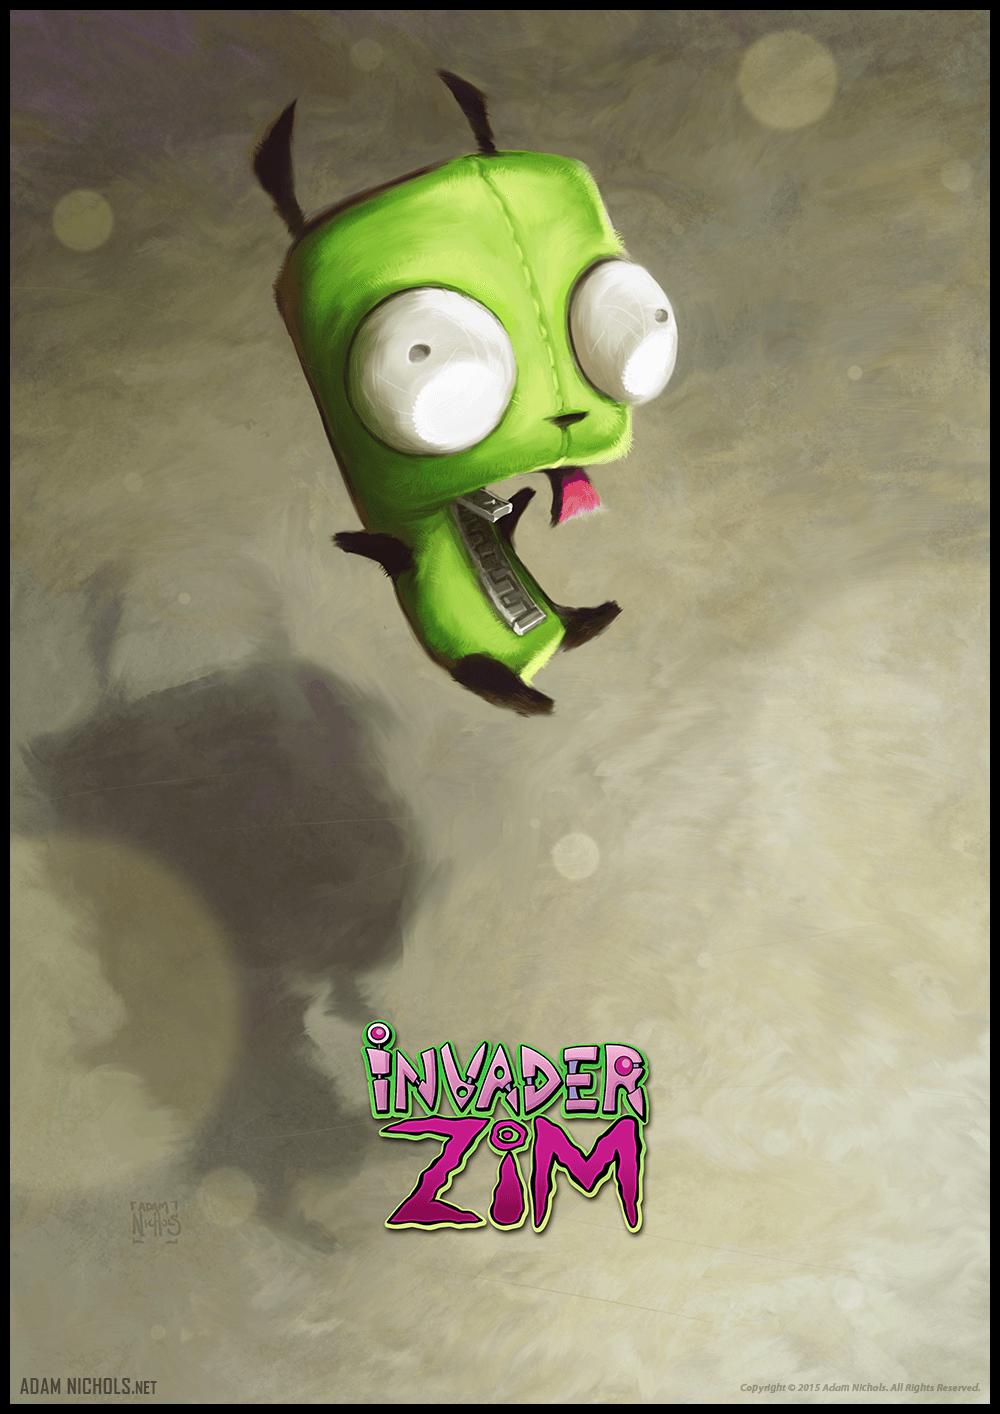 Invader Zim (GIR) Illustration - Fan Artwork by Adam Nichols